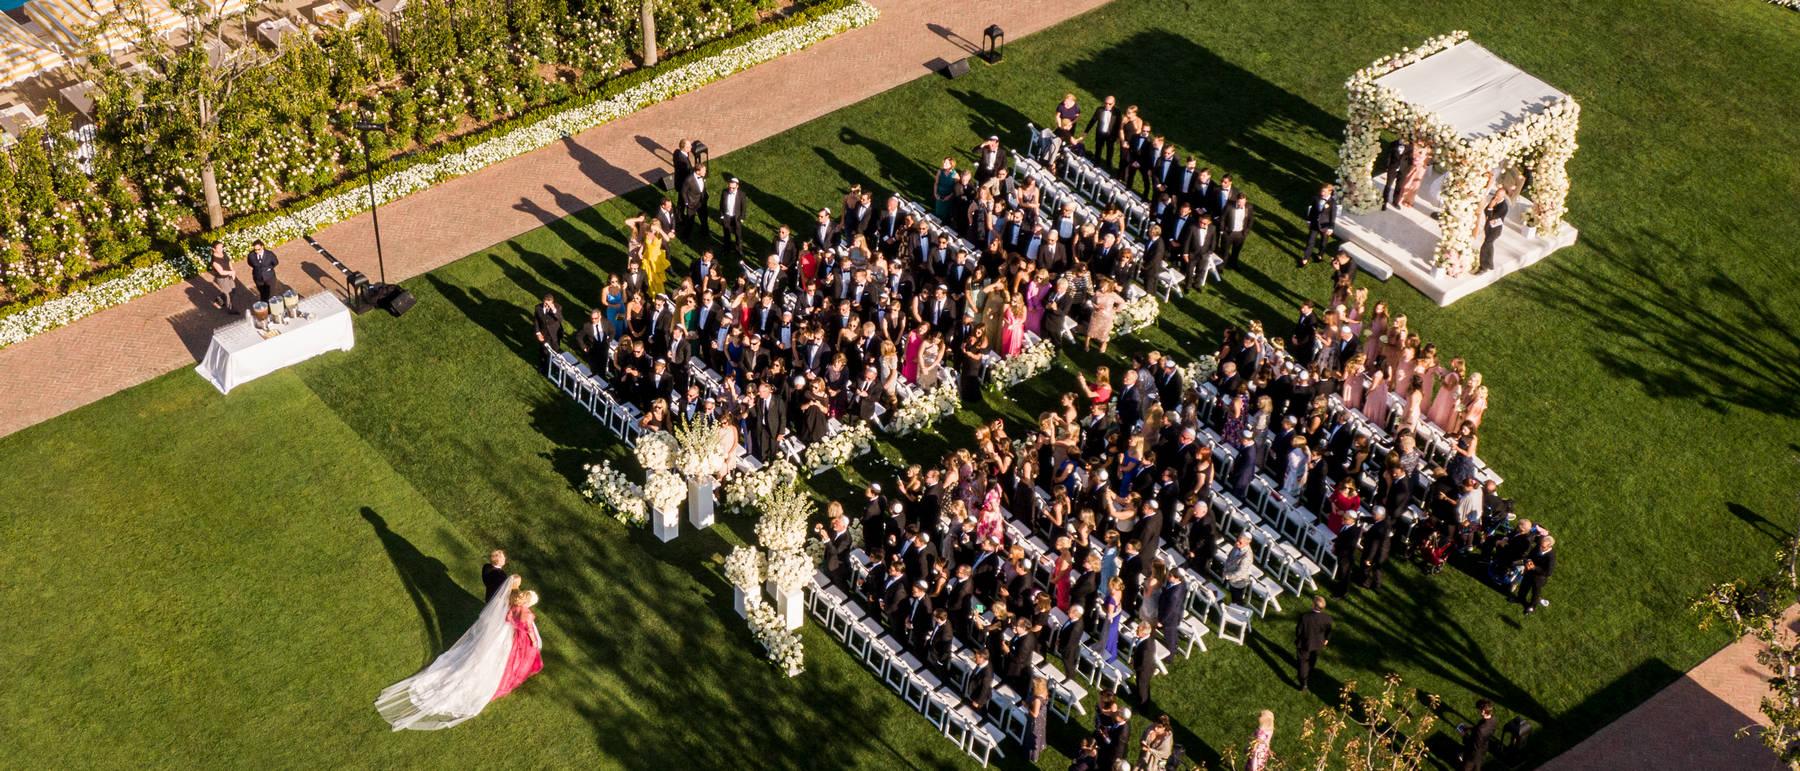 johnandjoseph-wedding-photographer-hz-slider-200